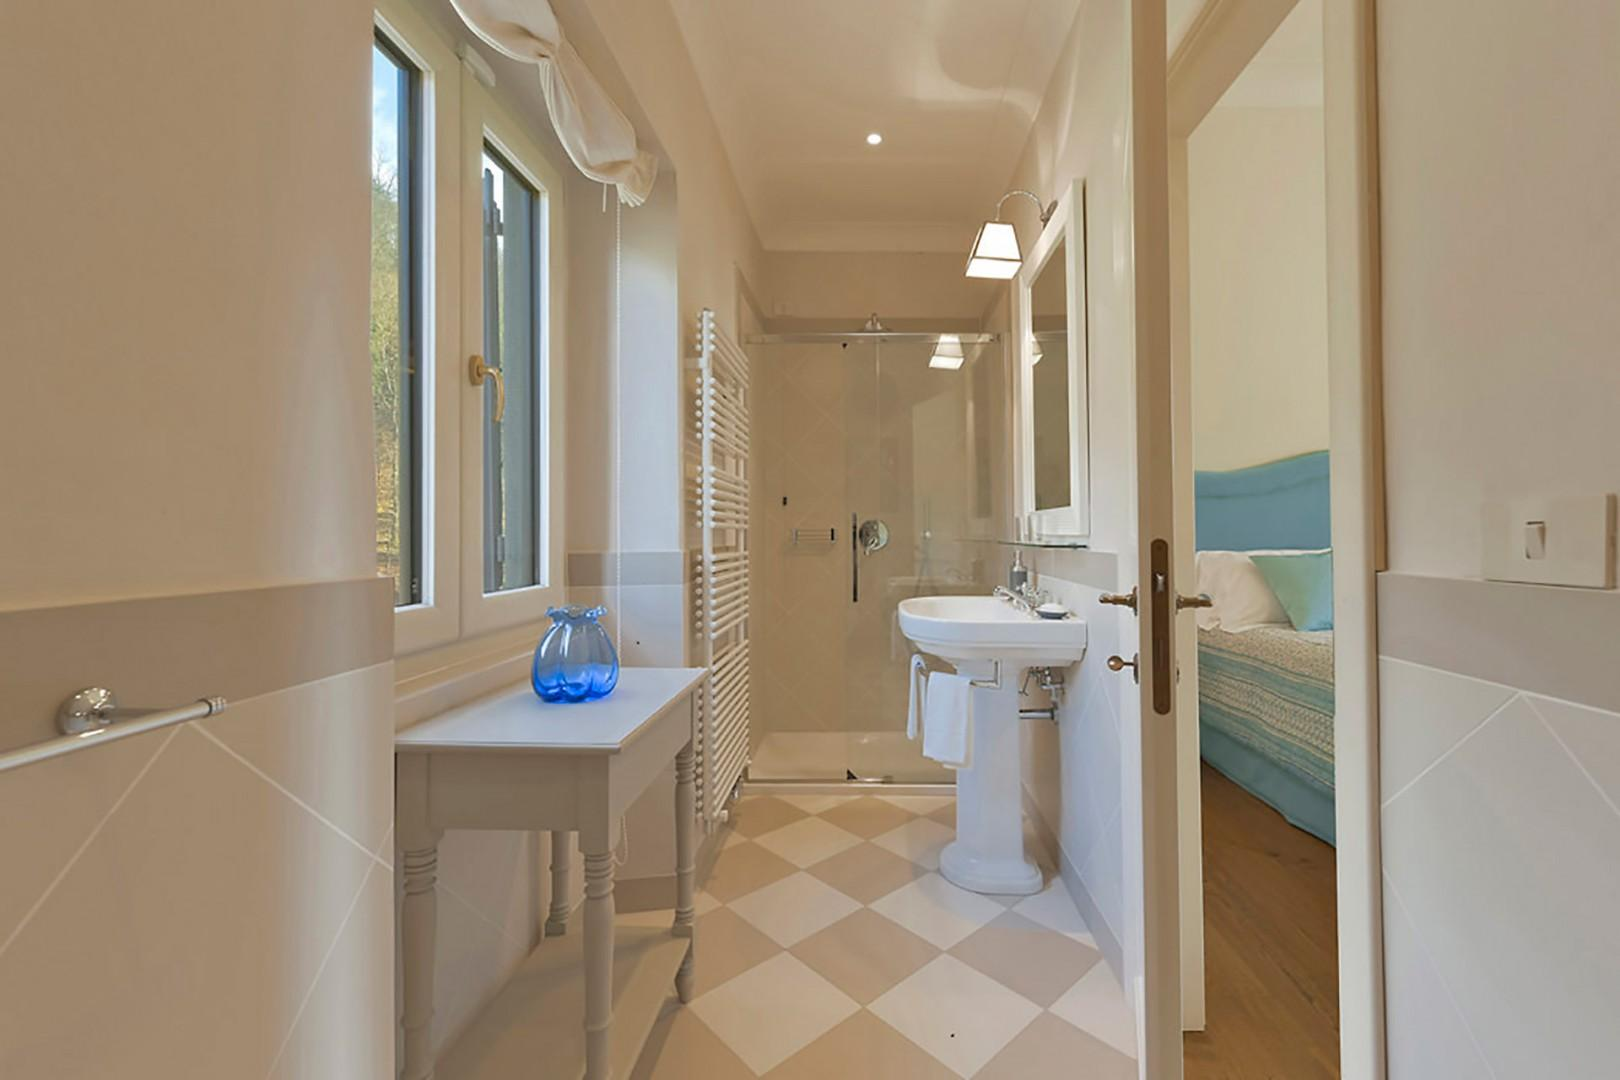 Bathroom 5 features heated towel racks and shower.